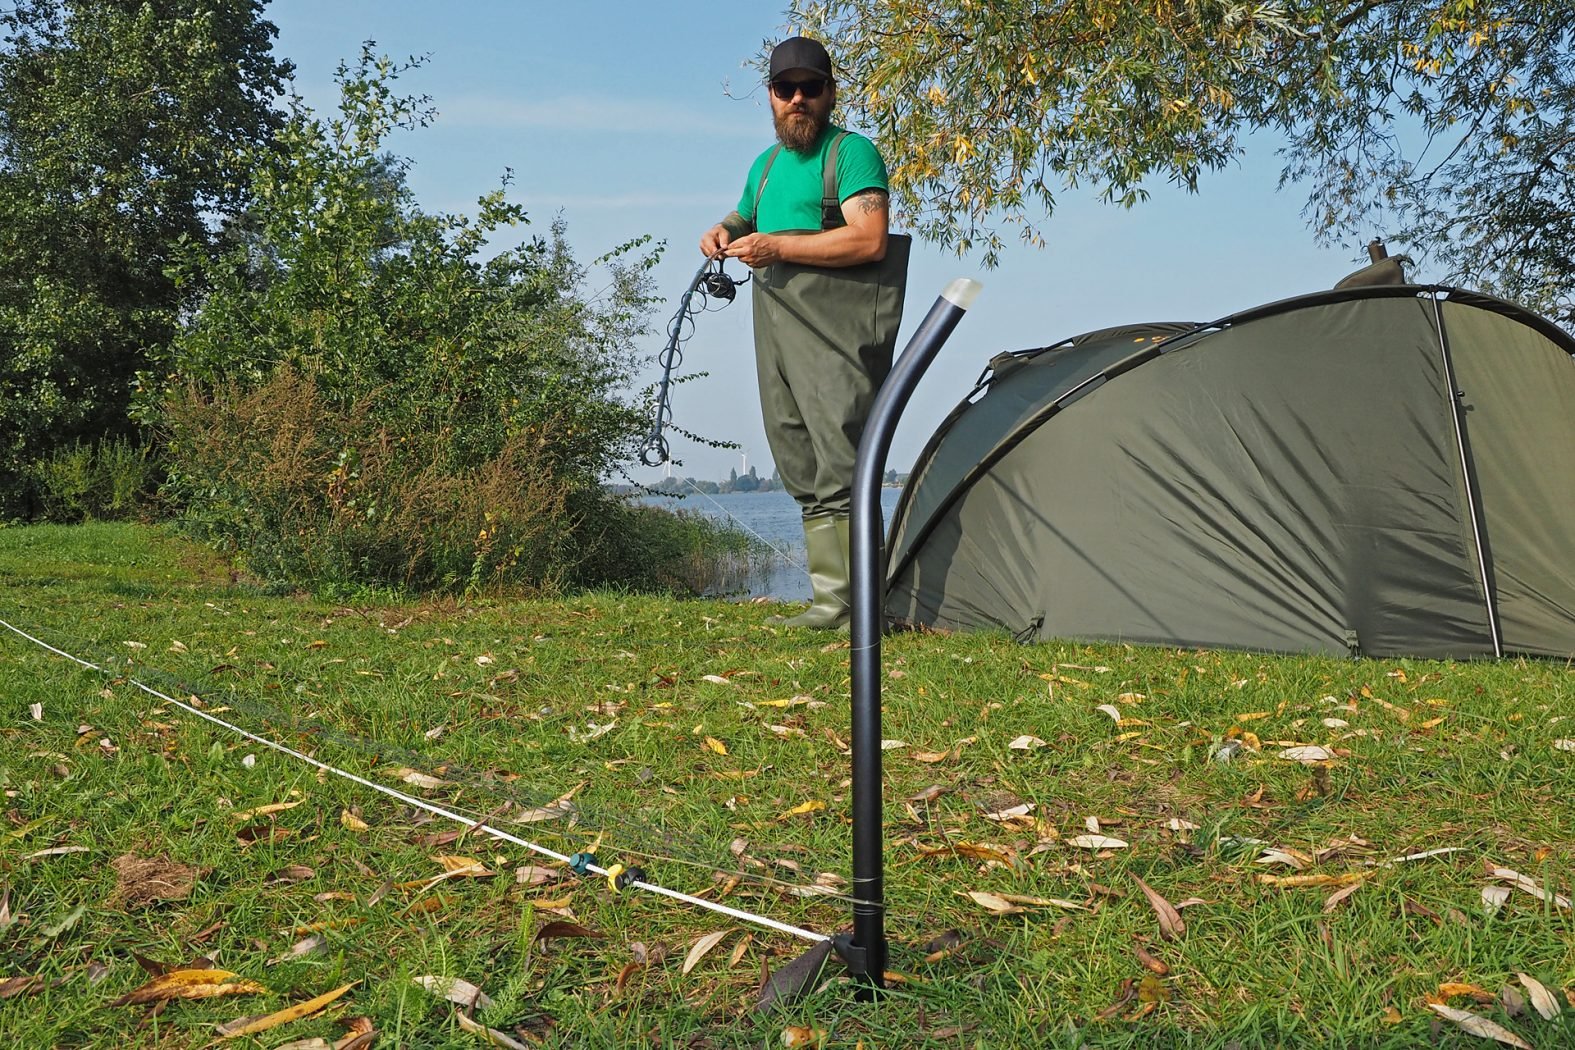 Avid Yard Sticks